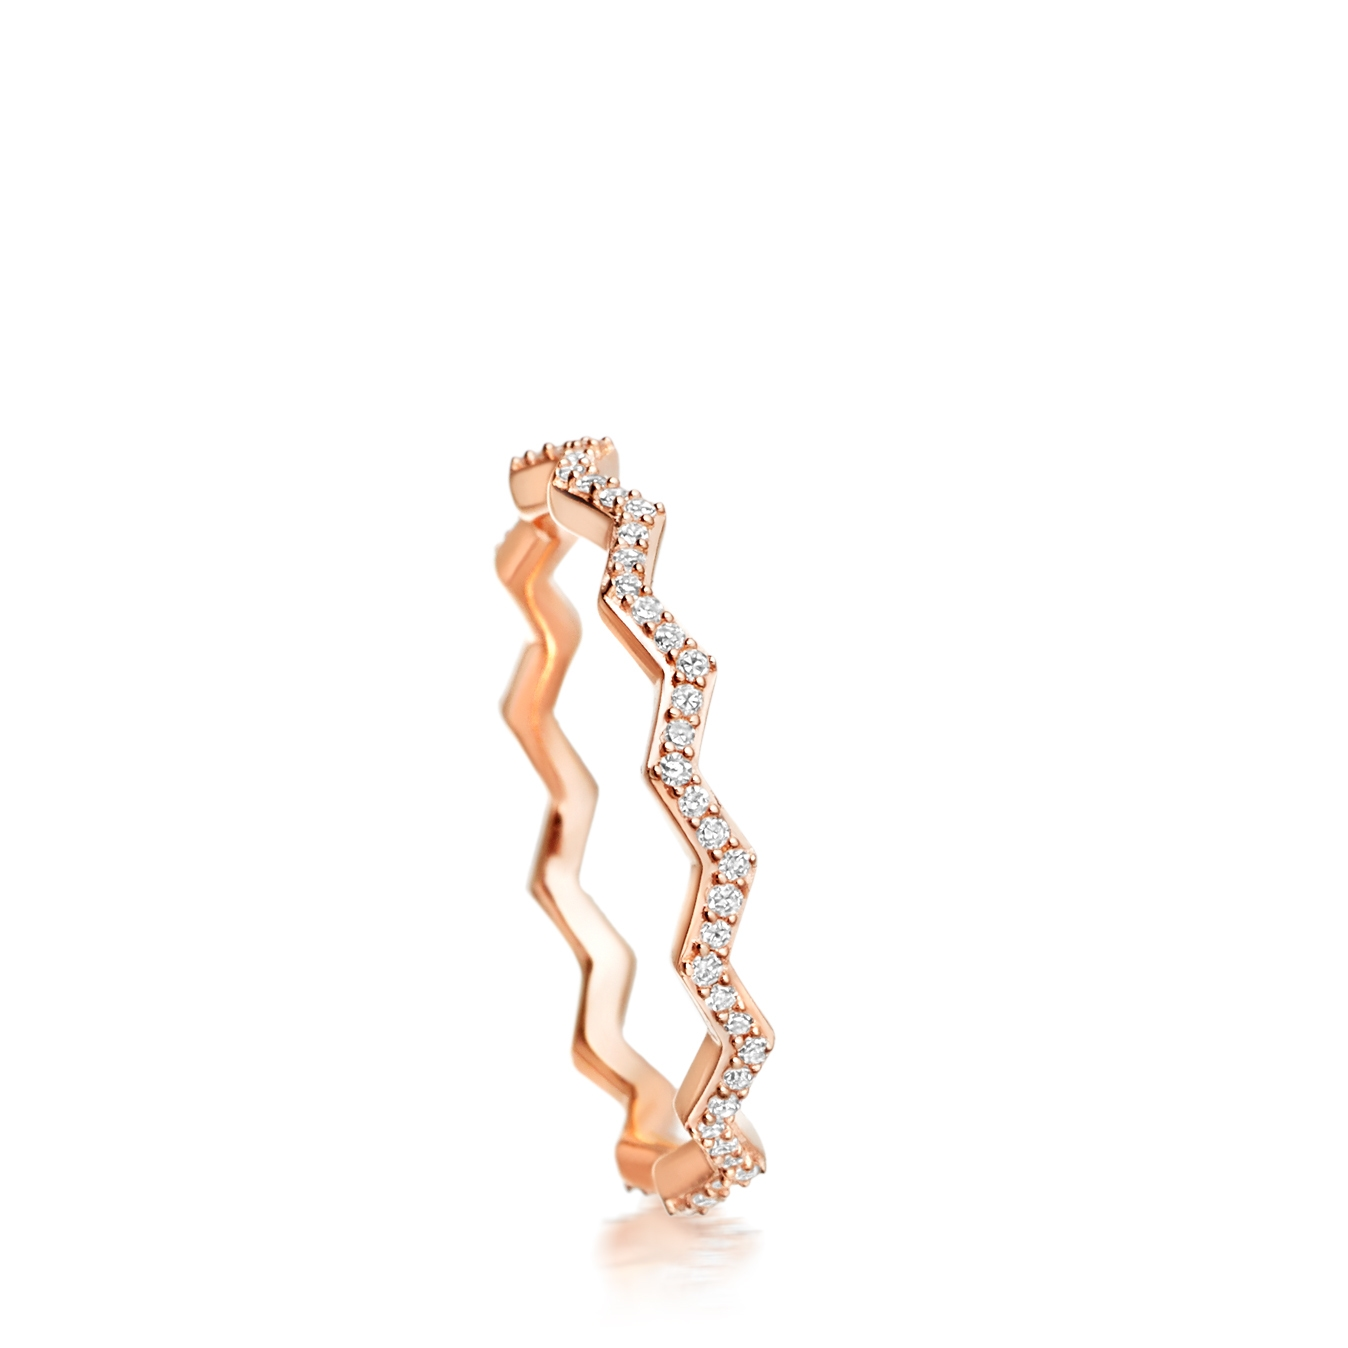 Varro Honeycomb Diamond Ring